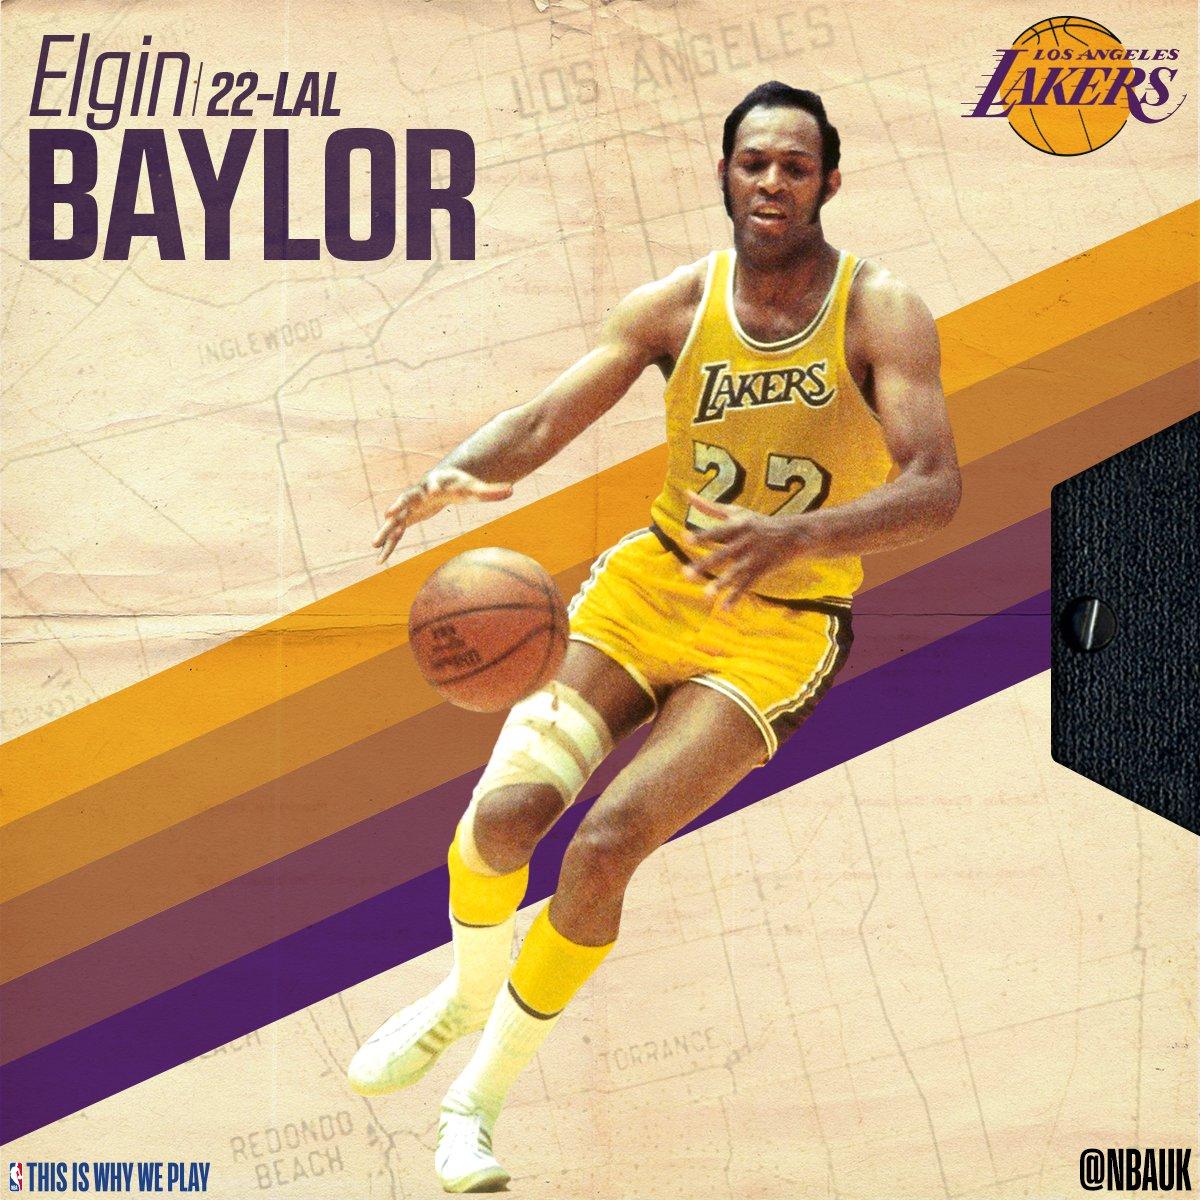 Happy birthday to legend, Elgin Baylor!